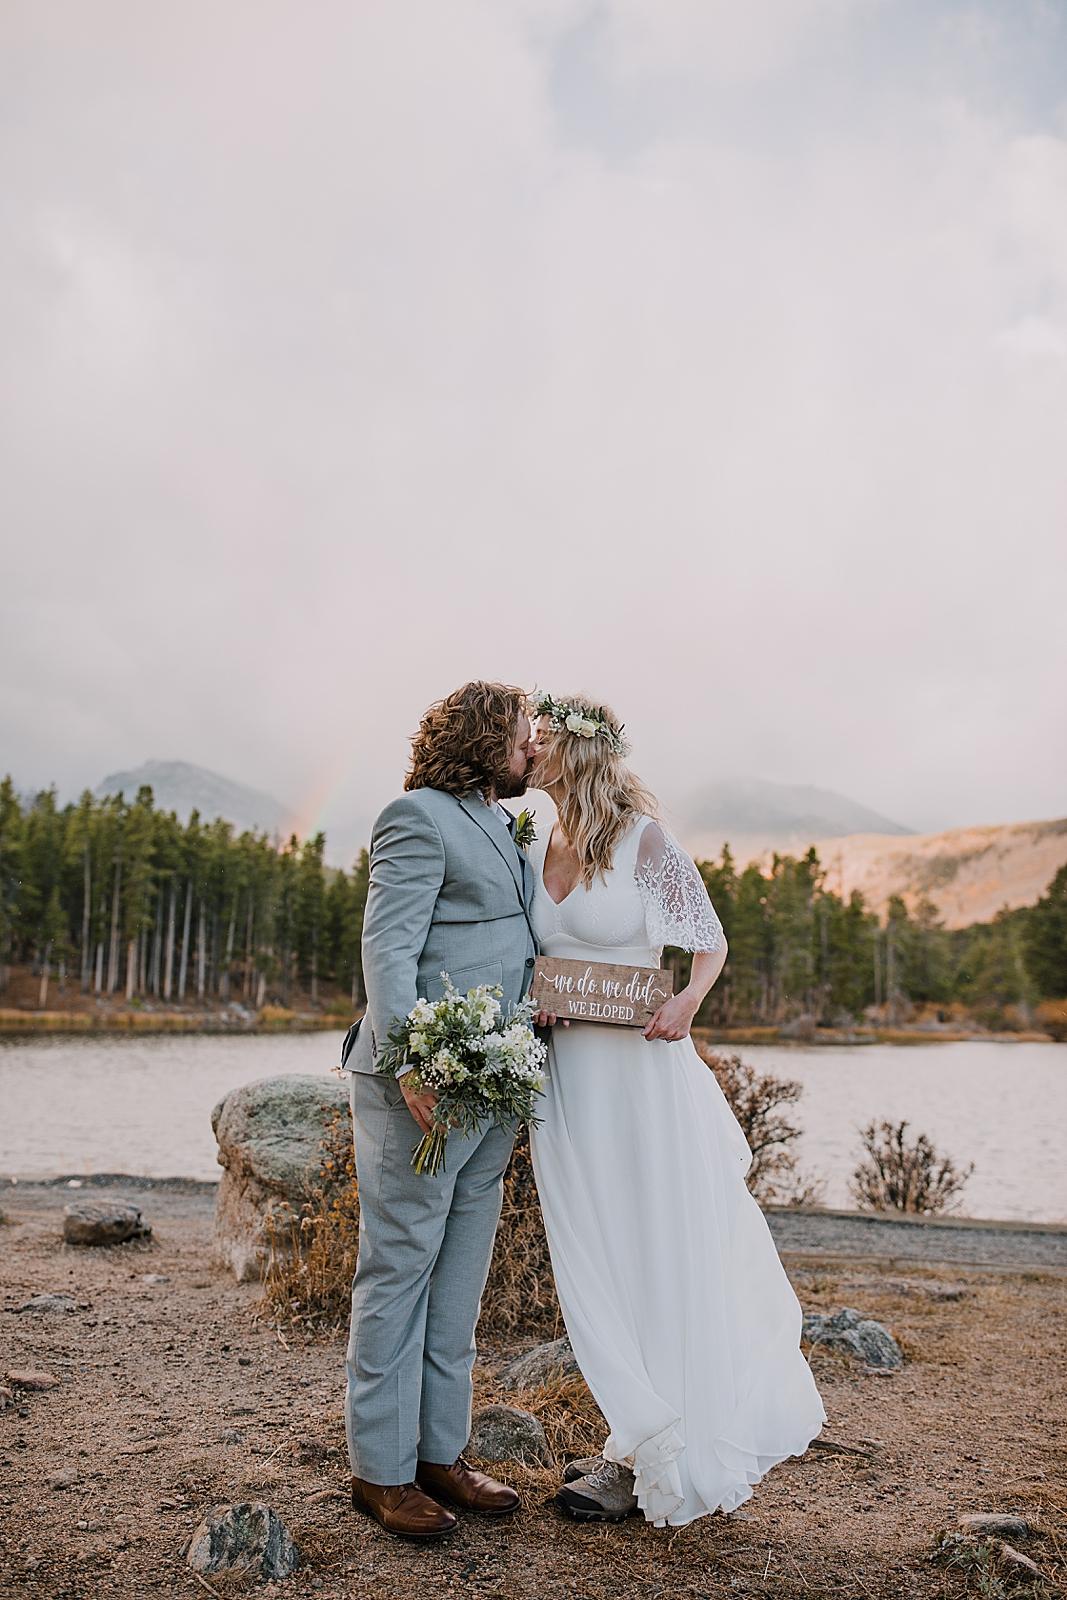 elopement couple kissing, sprague lake dock elopement, sunrise elopement, colorado elopement, sprague lake elopement, rocky mountain national park elopement, adventurous colorado hiking elopement